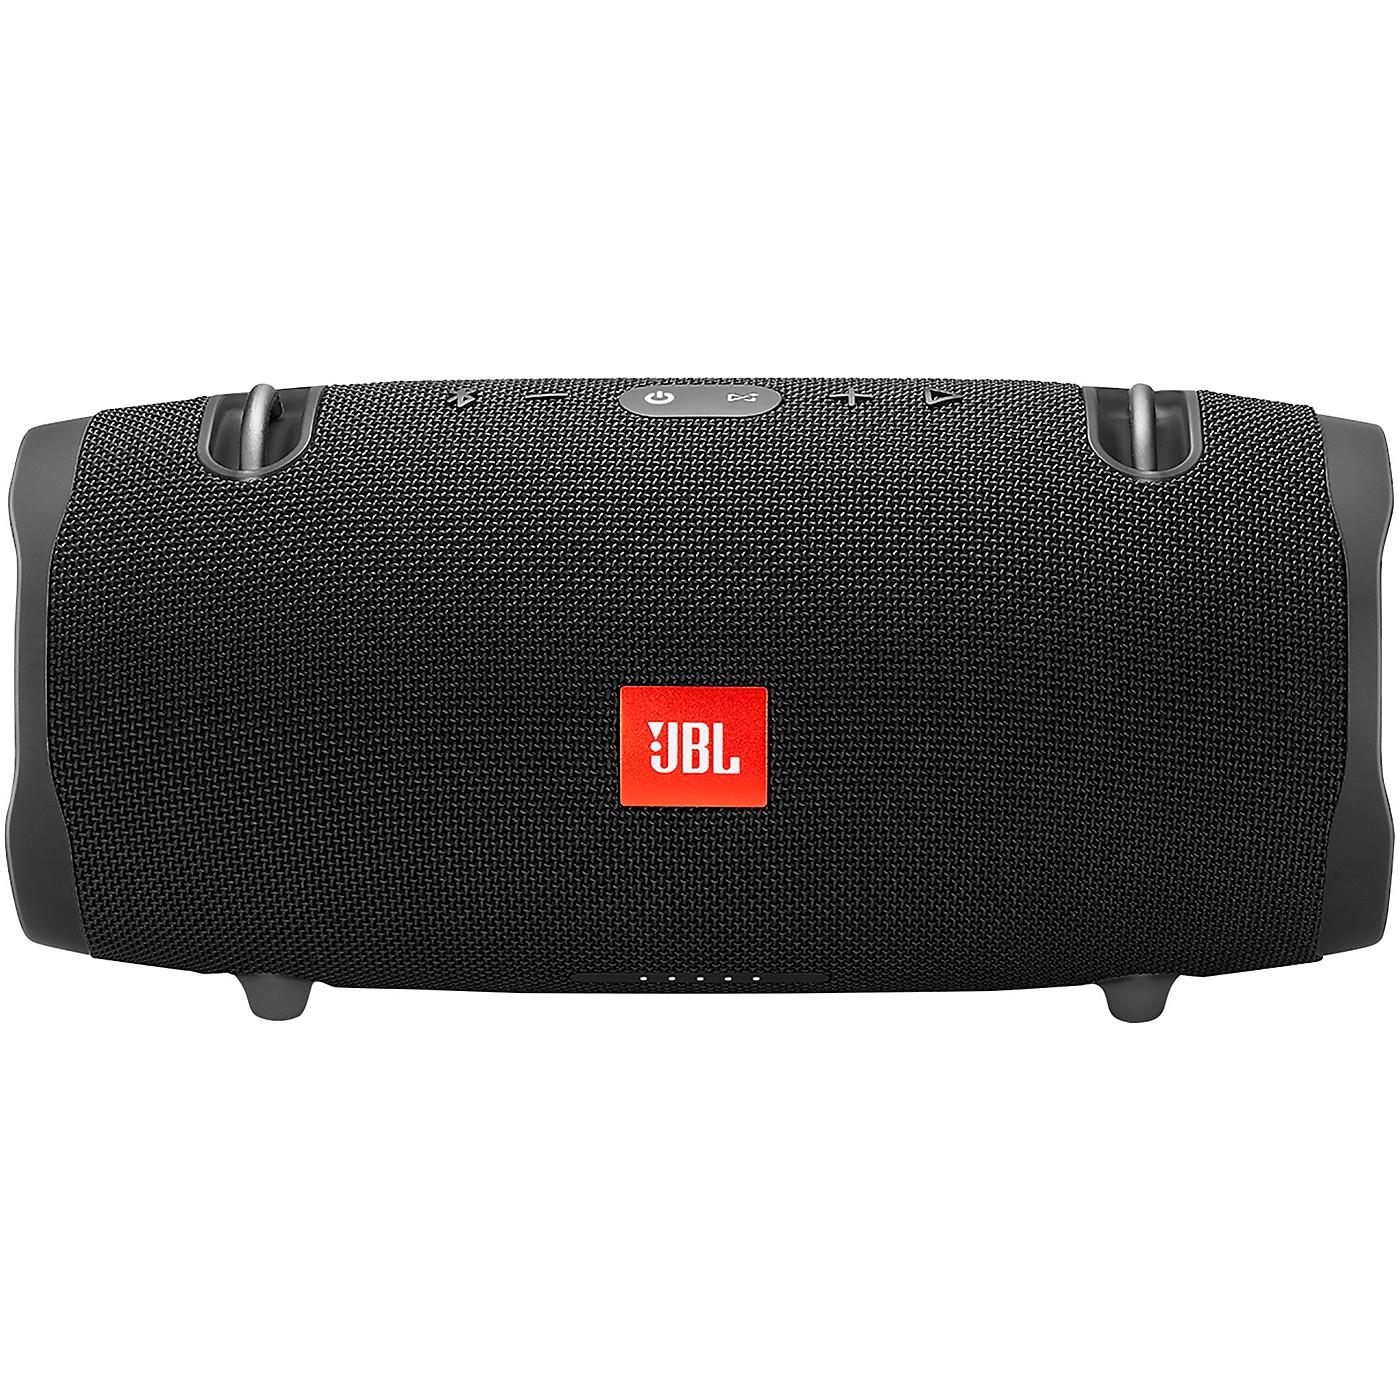 JBL Xtreme 2 Waterproof Portable Bluetooth Speaker w/15 Hours of Playtime thumbnail